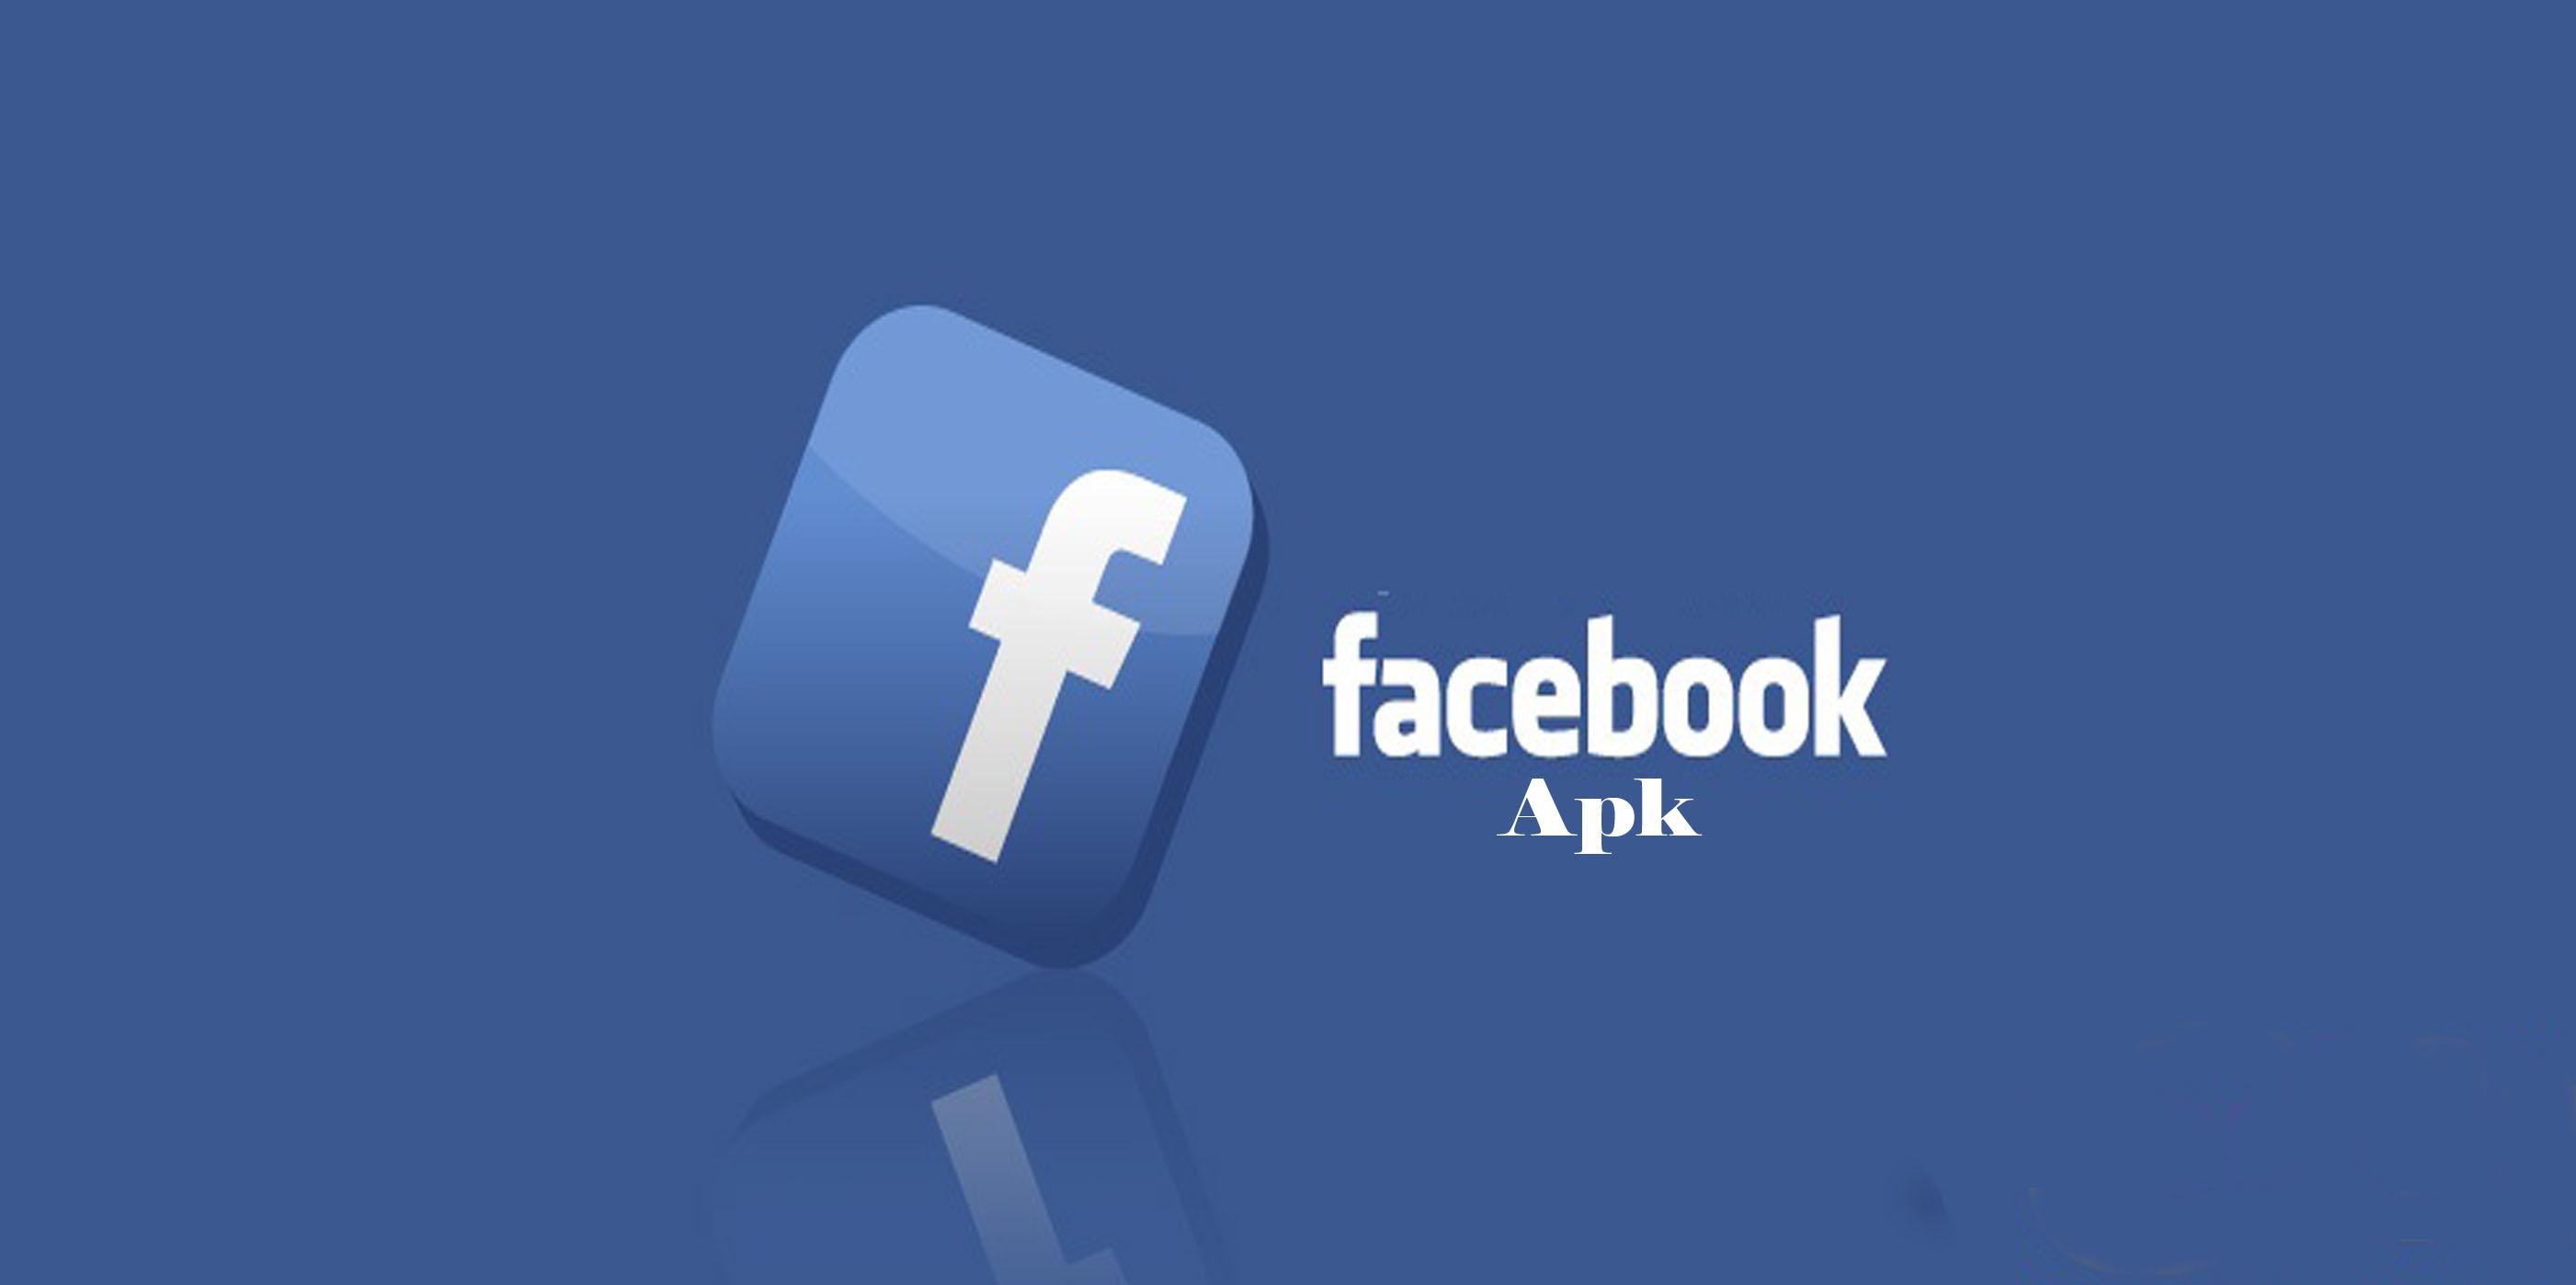 Facebook Apk - The Facebook Mobile Application   Makeover Arena